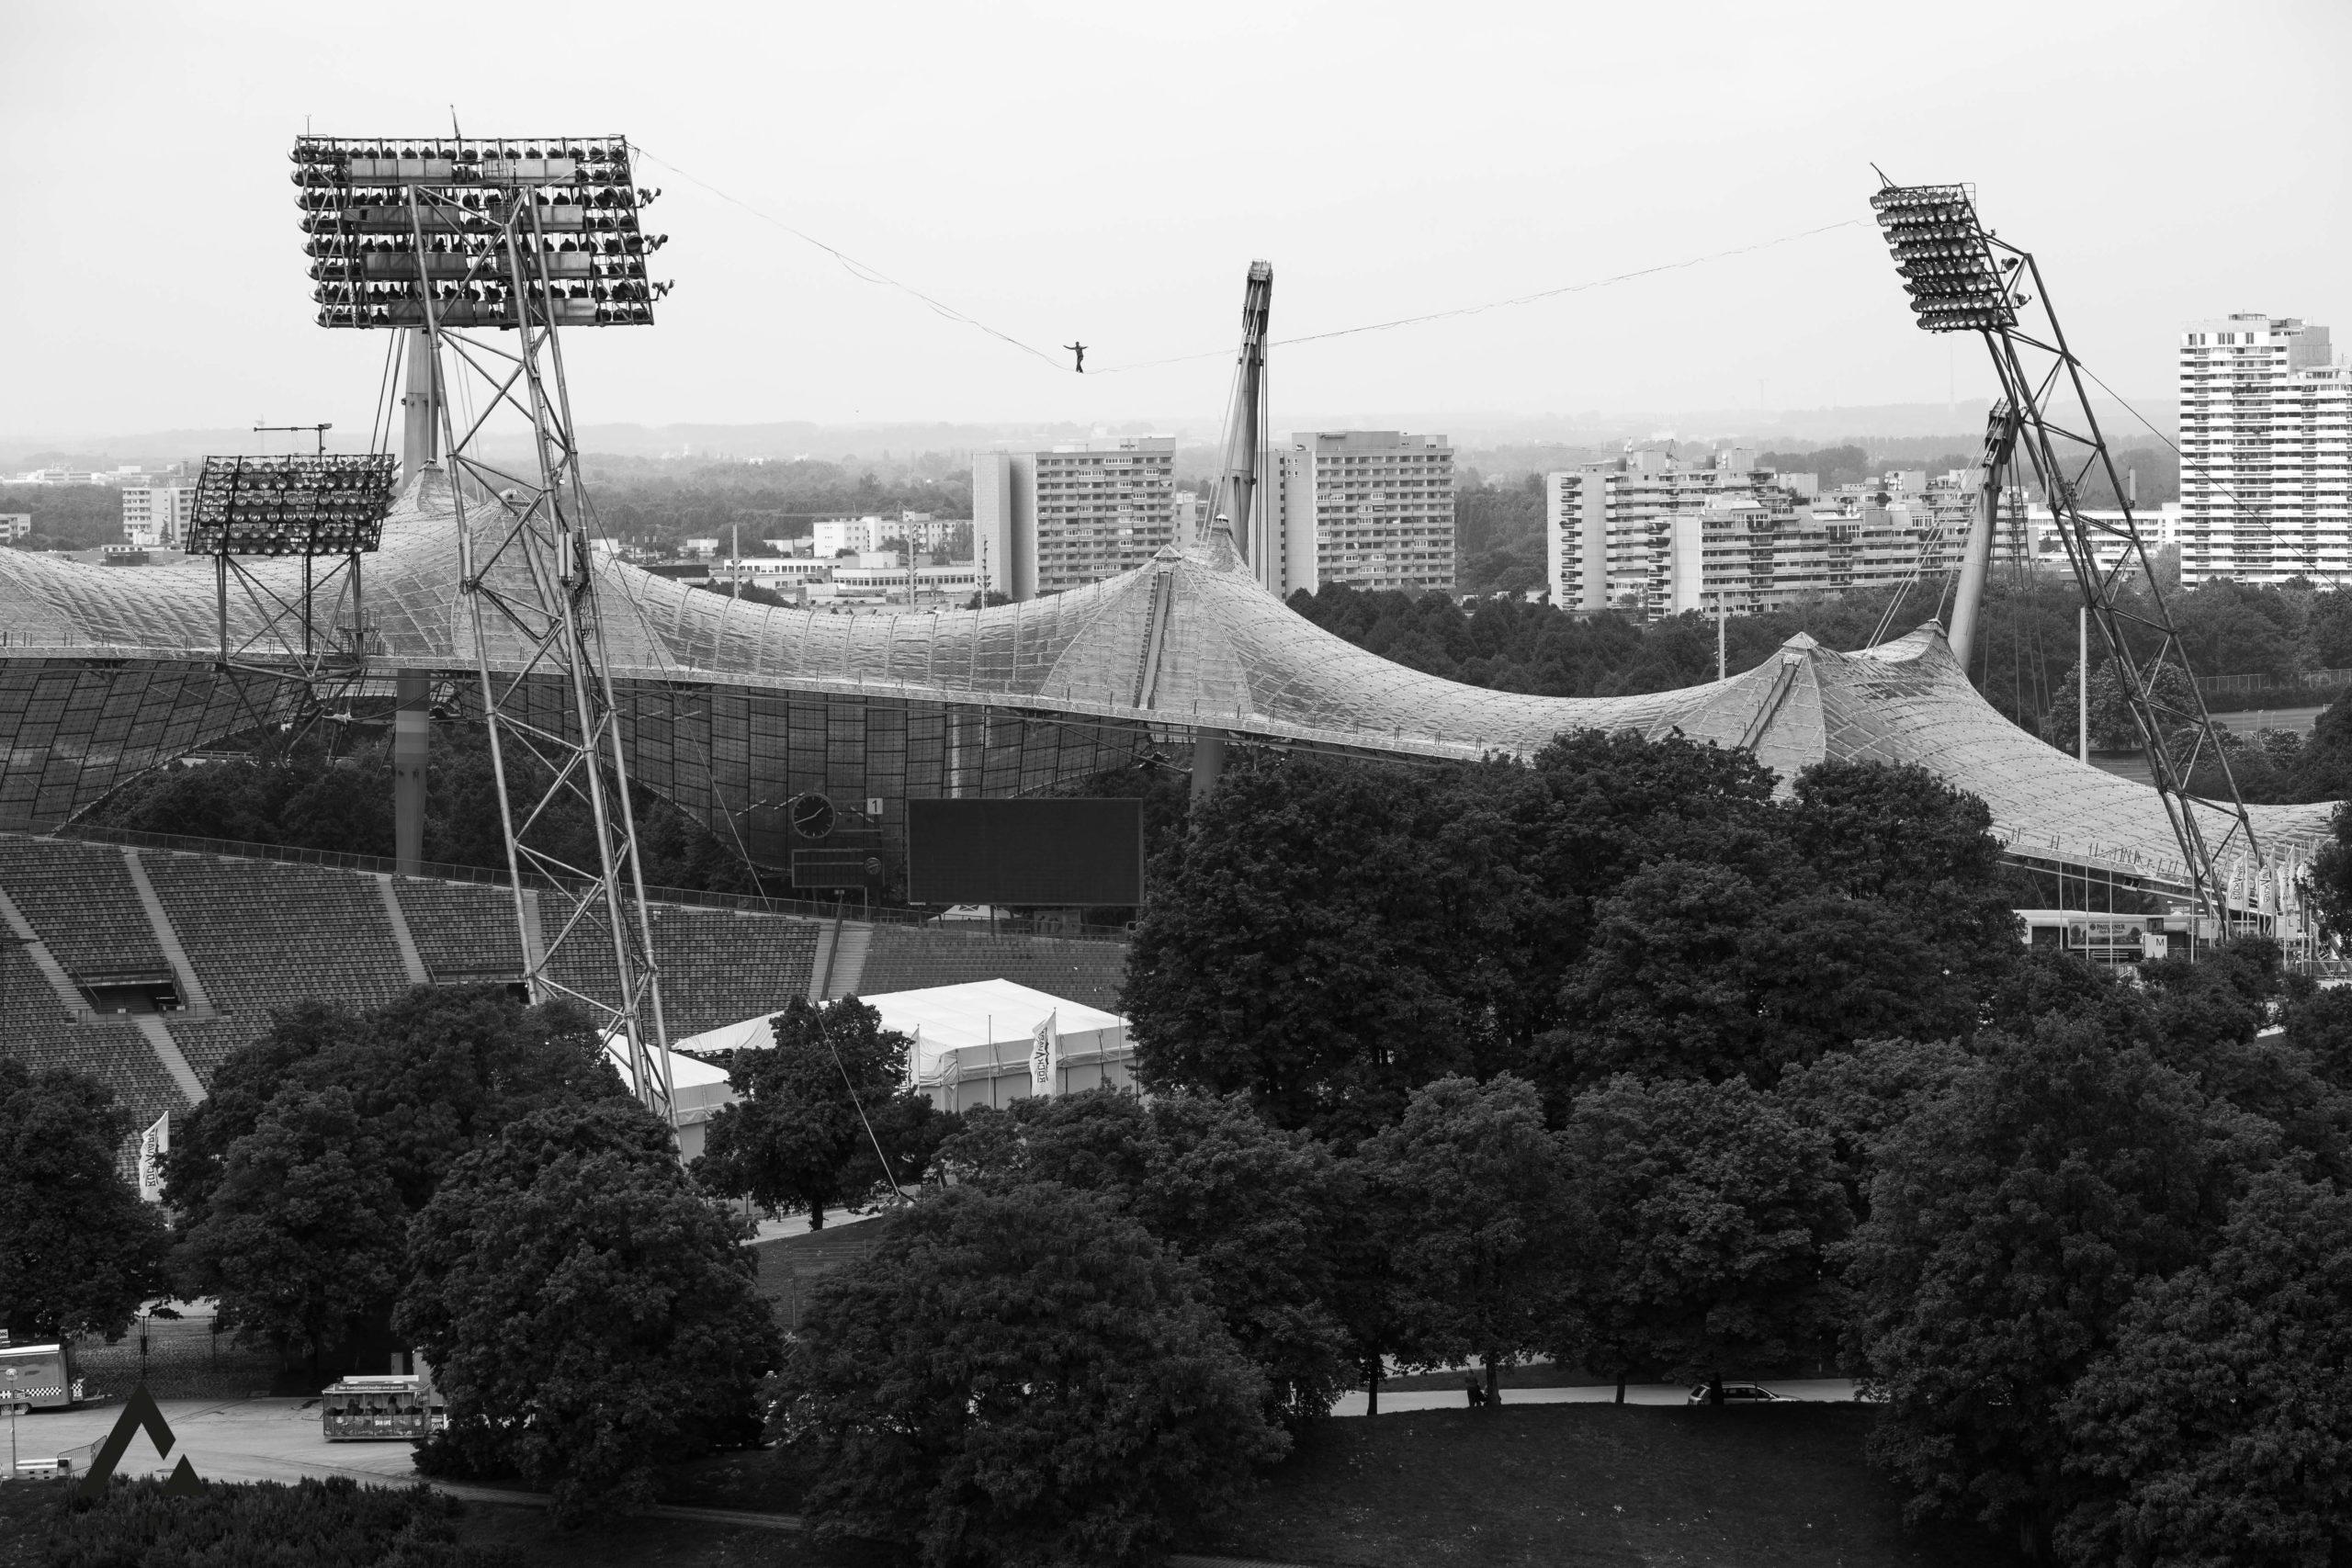 Highline_Olympiastadion_Probeaufbau_Copyright_ValentinRapp-10